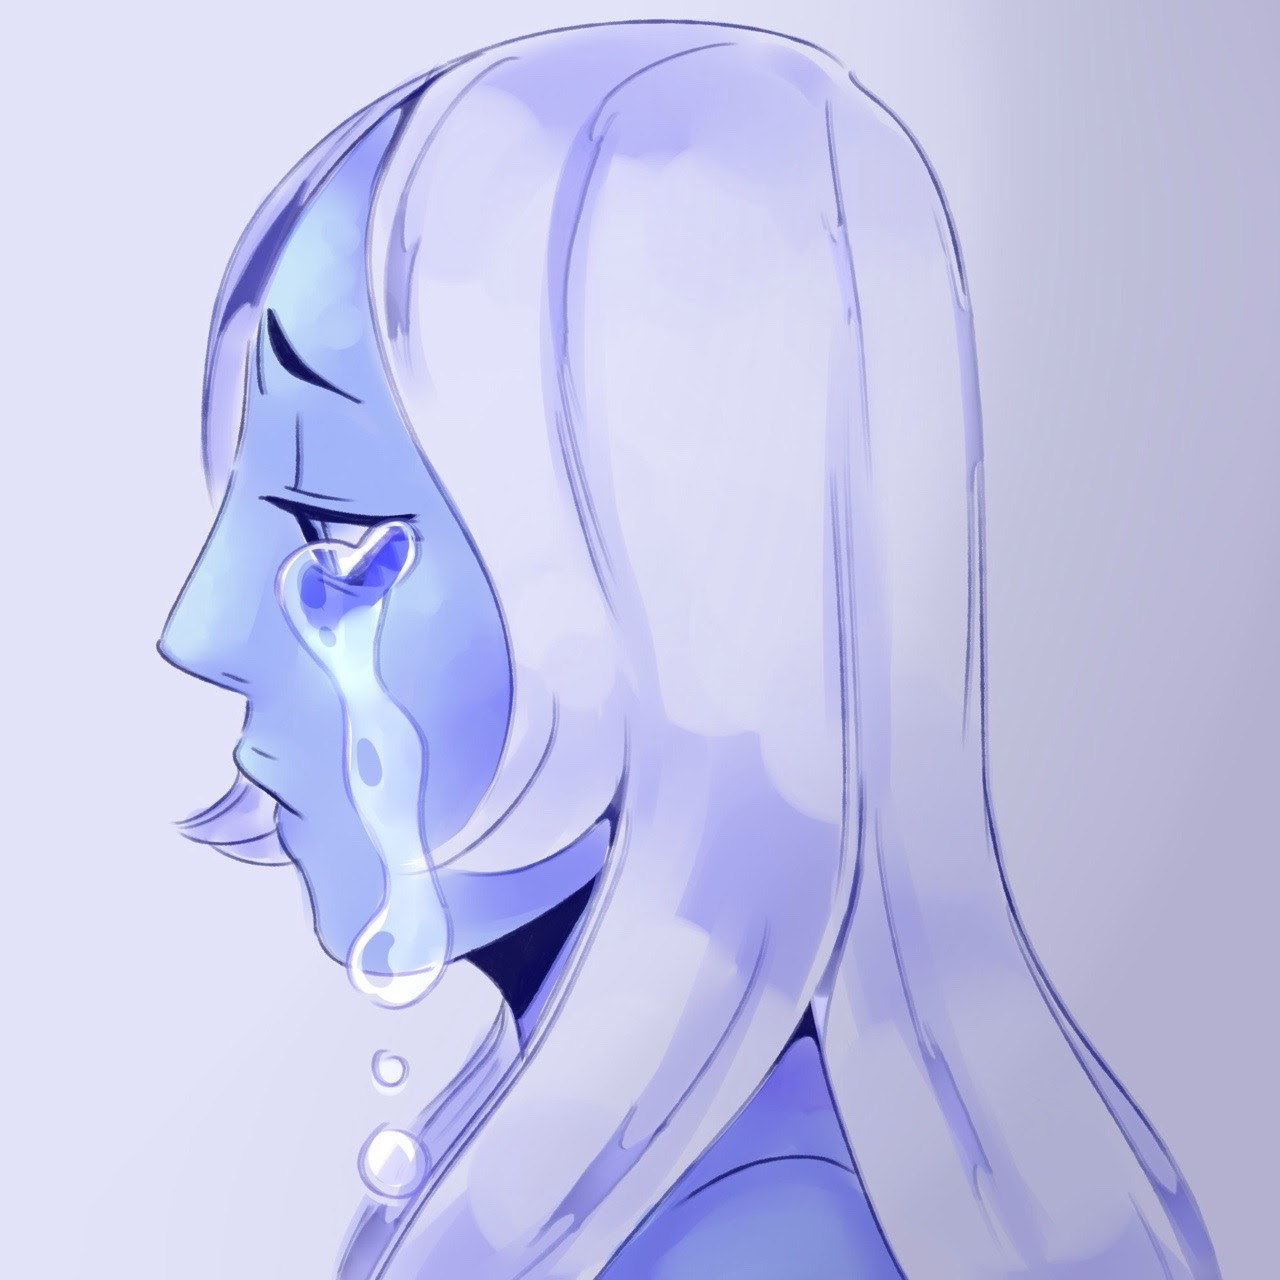 quick doodle of a sad blue